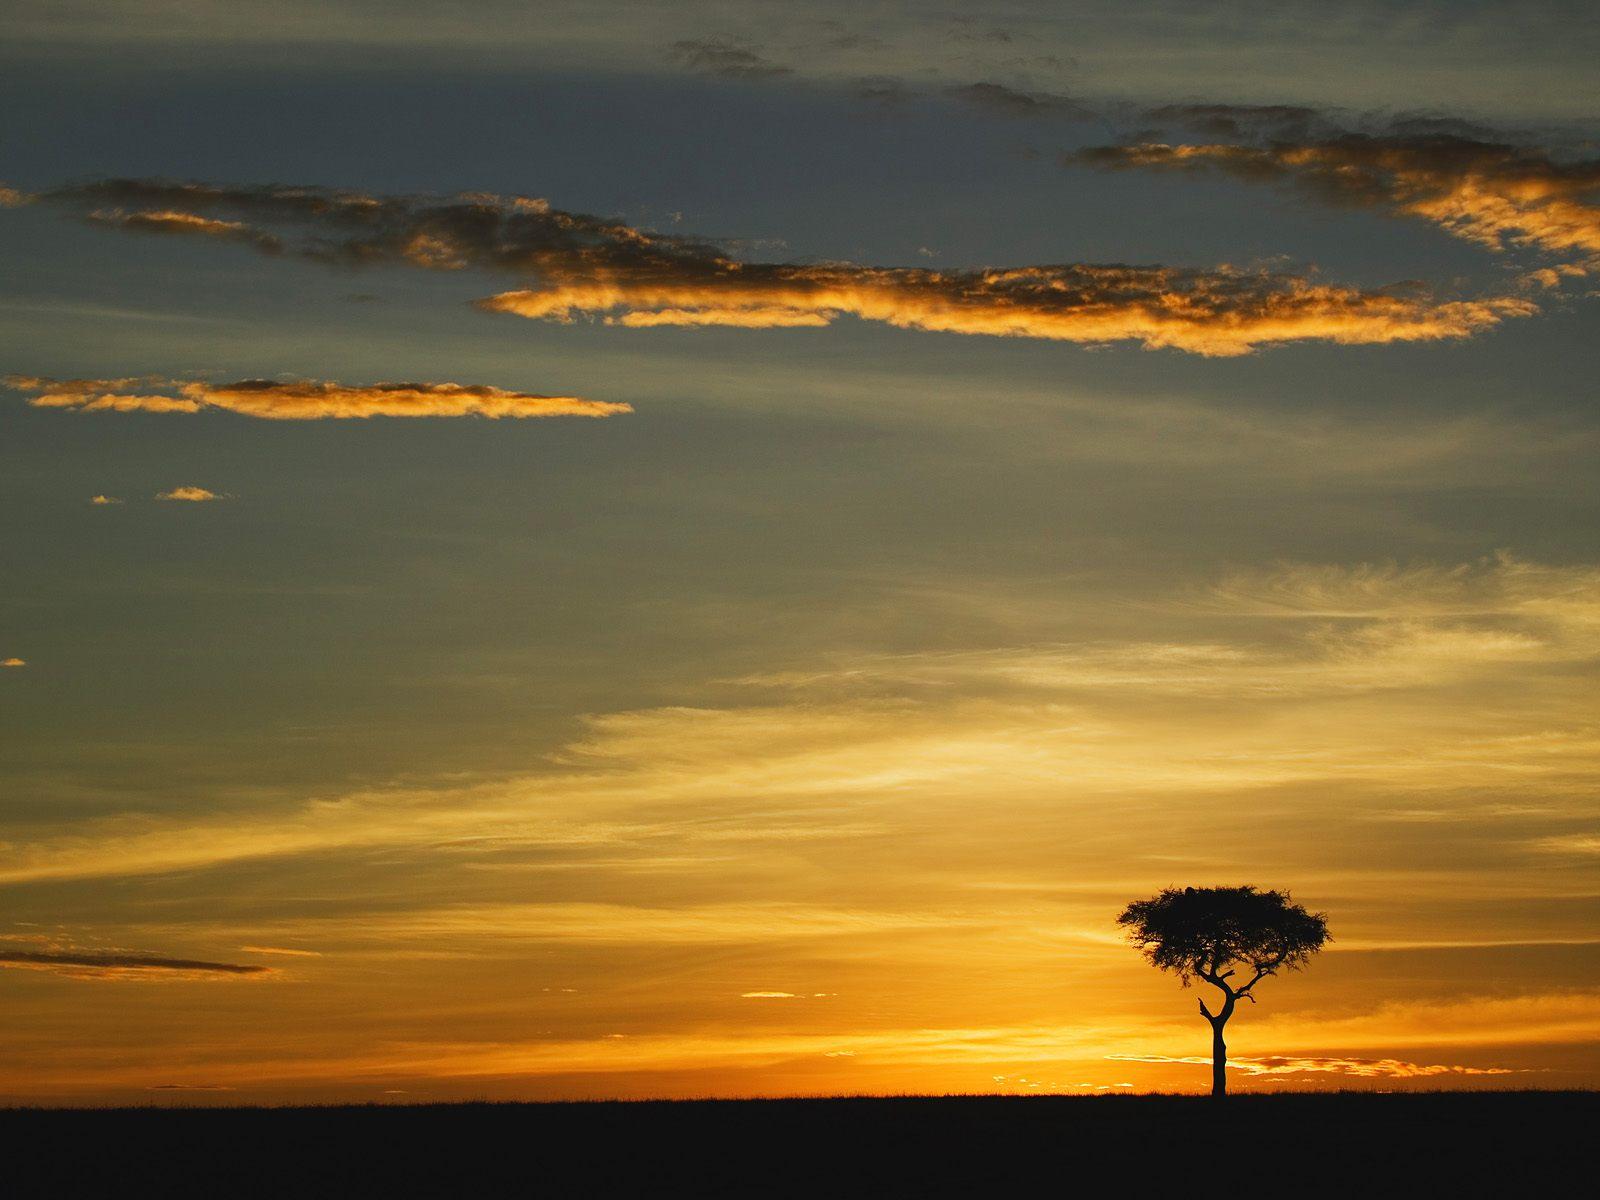 Single acacia tree at sunrise masai mara kenya for Single wallpaper